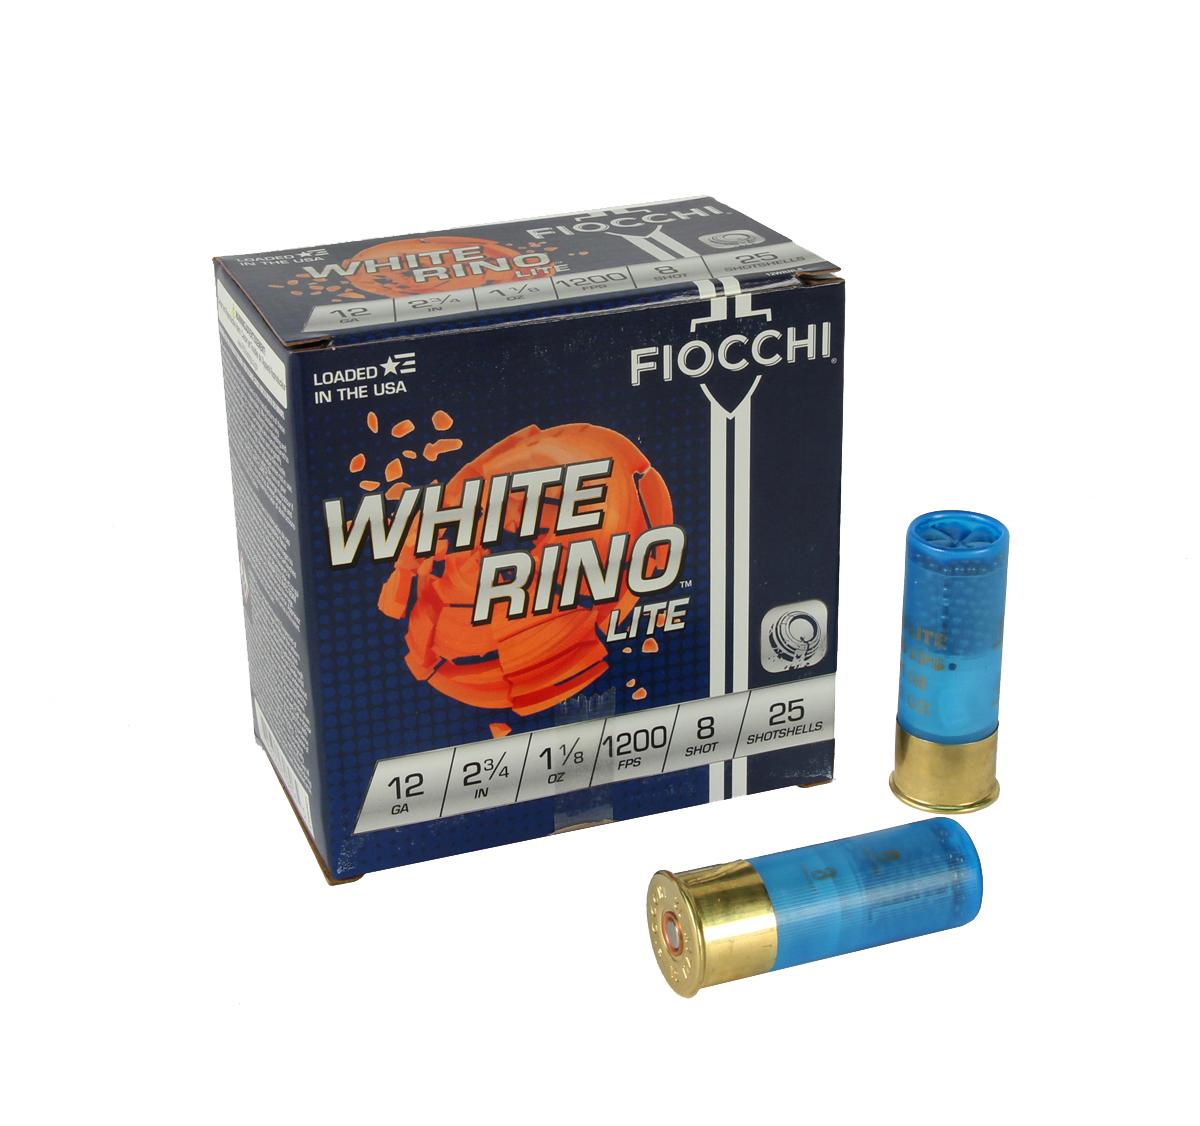 Fiocchi White Rino Lite 12 Gauge 2.75